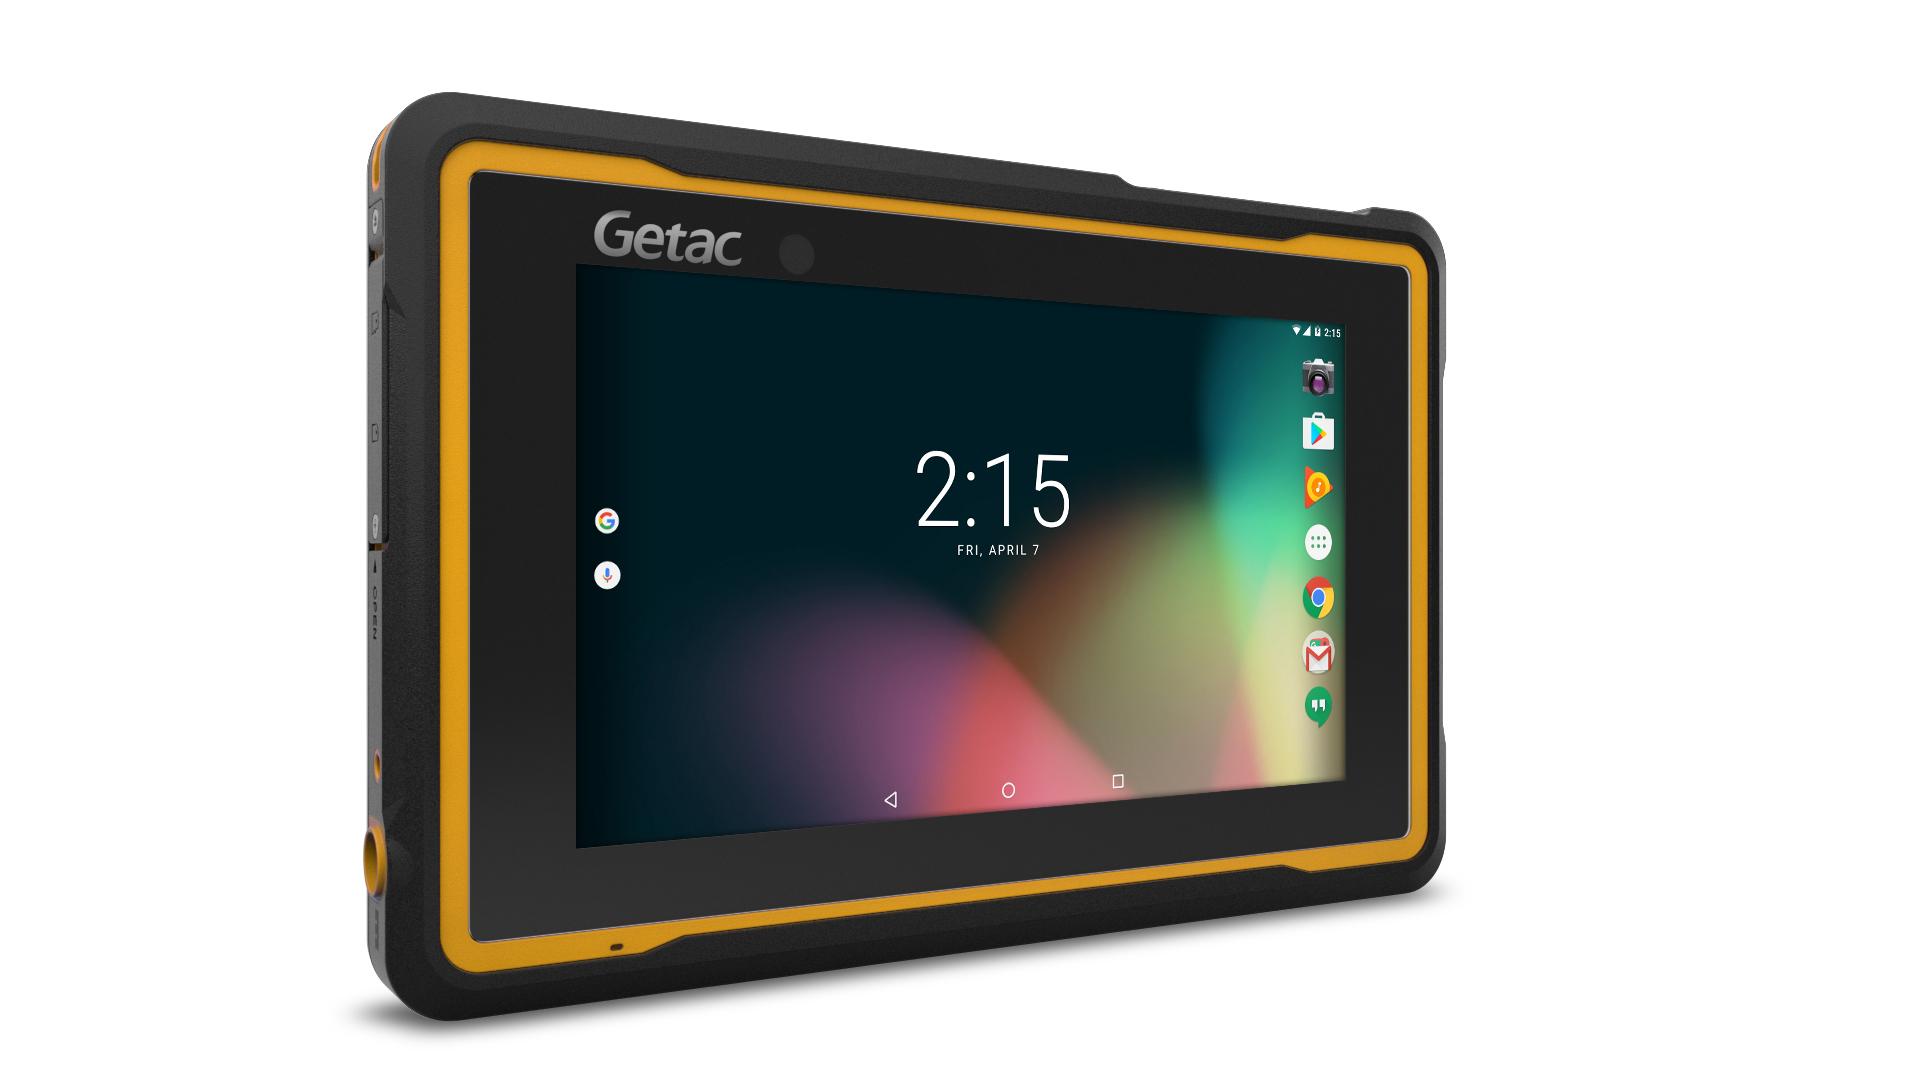 Getac ZX70 - x5-Z8350 - GPS - 8MP Rear Camera